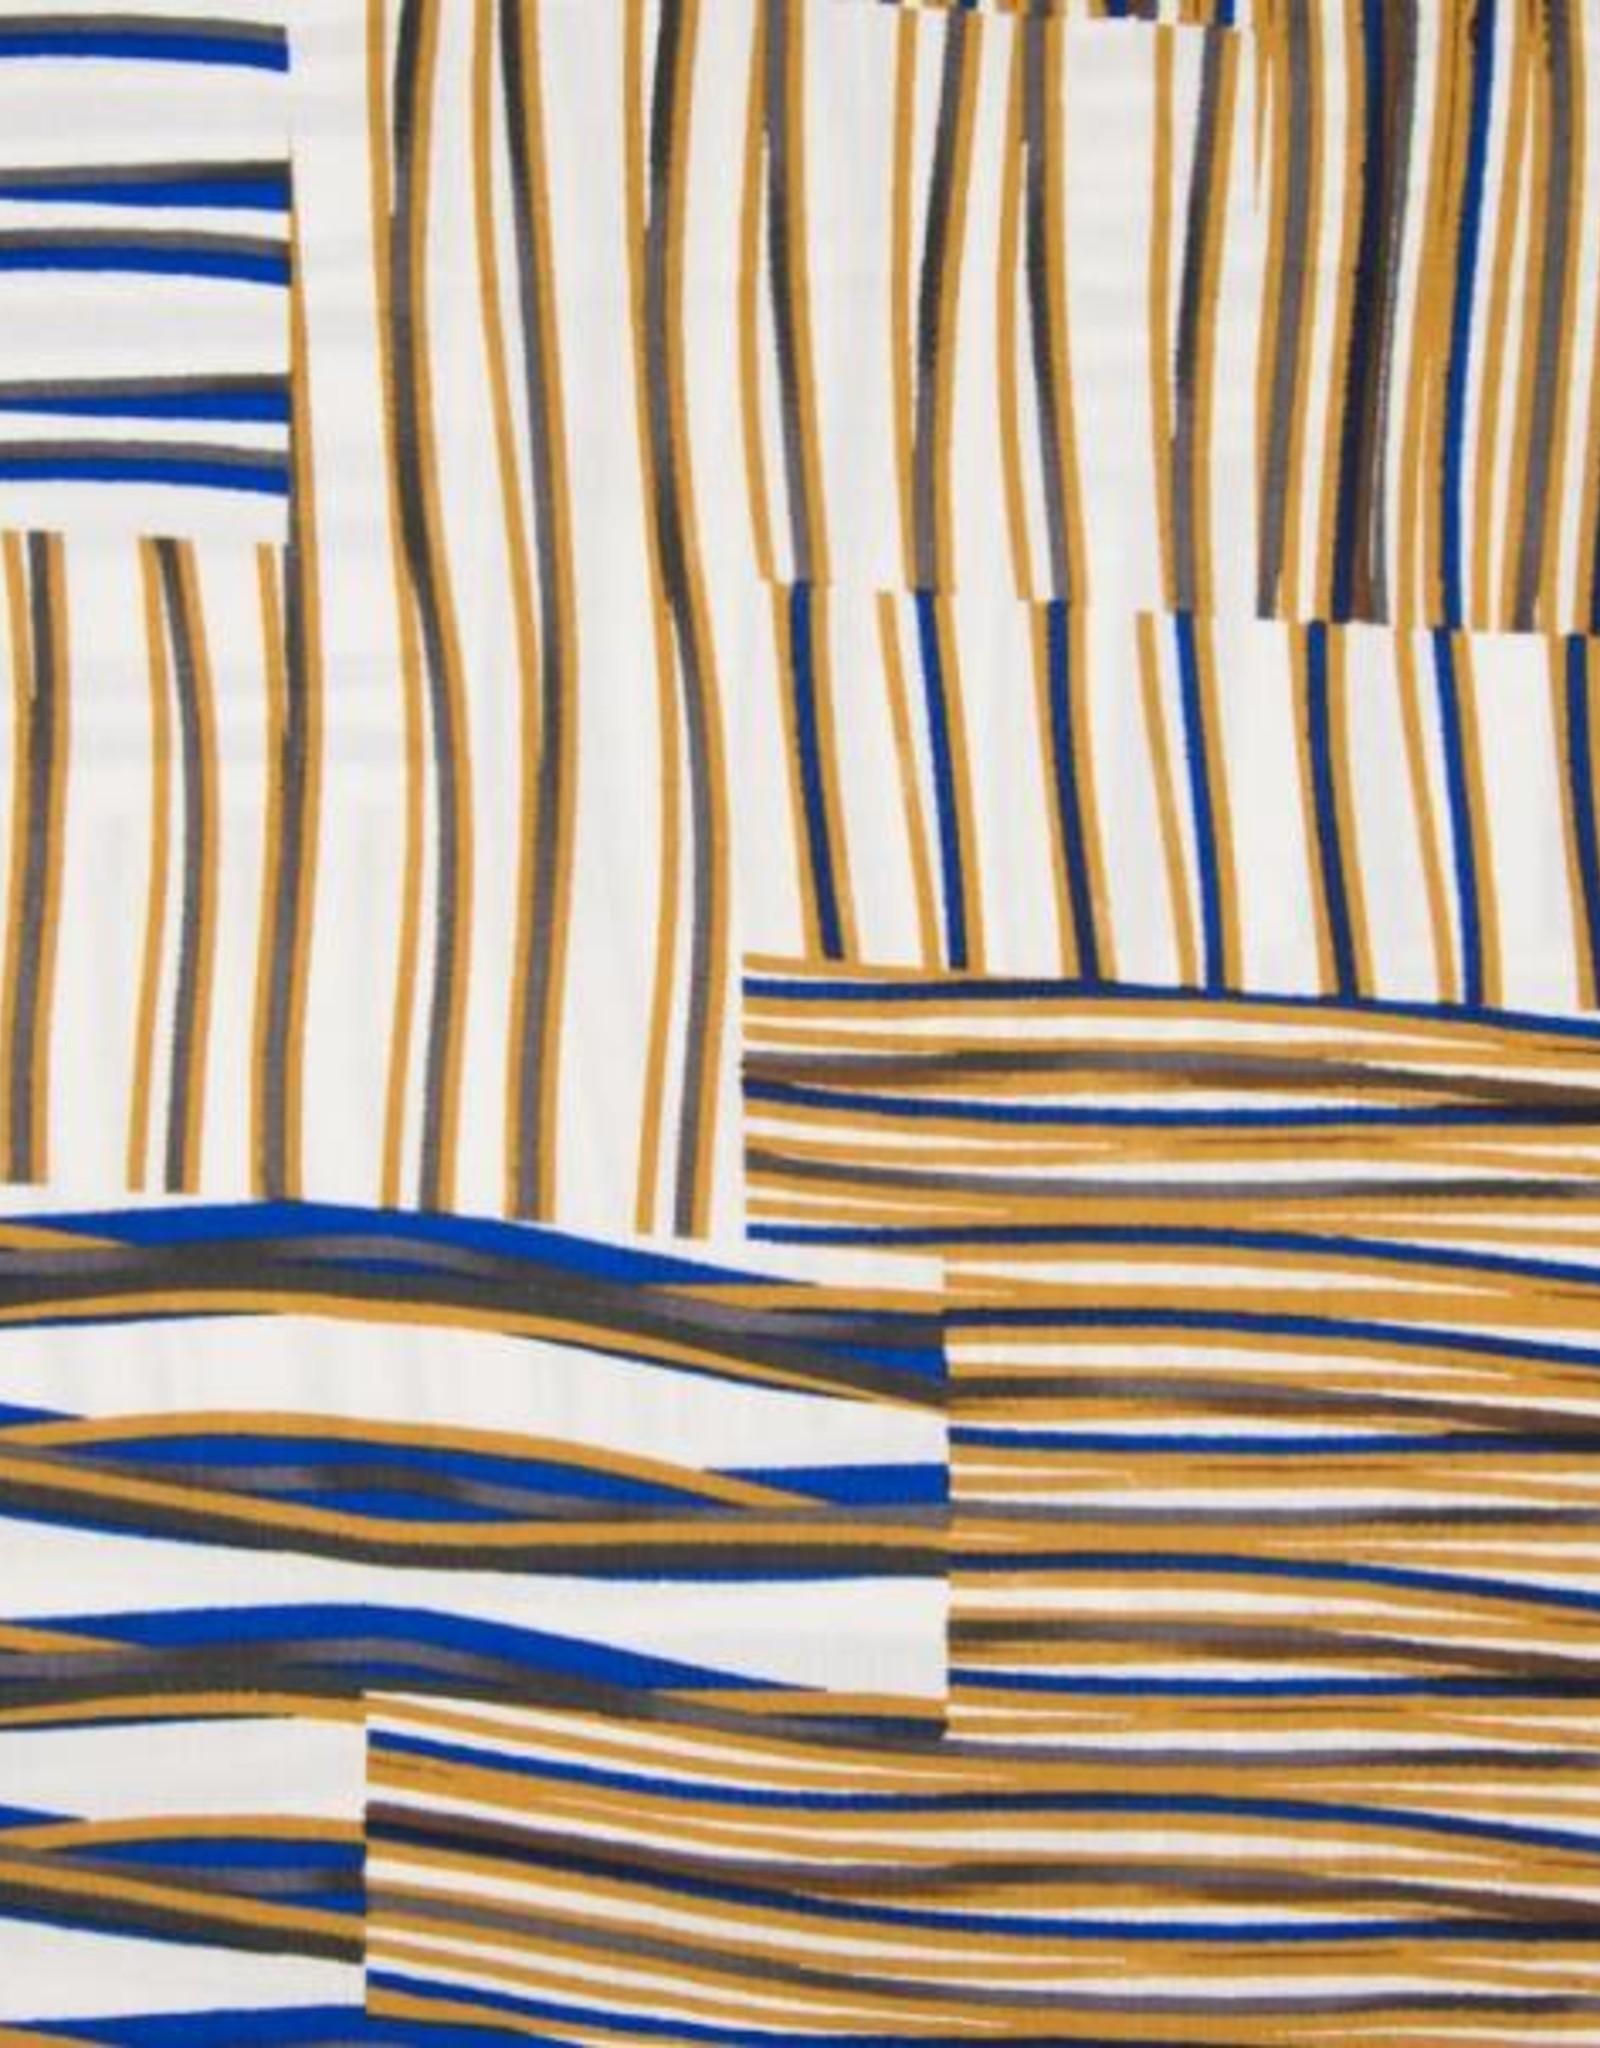 *Viscose stripes royal blauw wit bruin